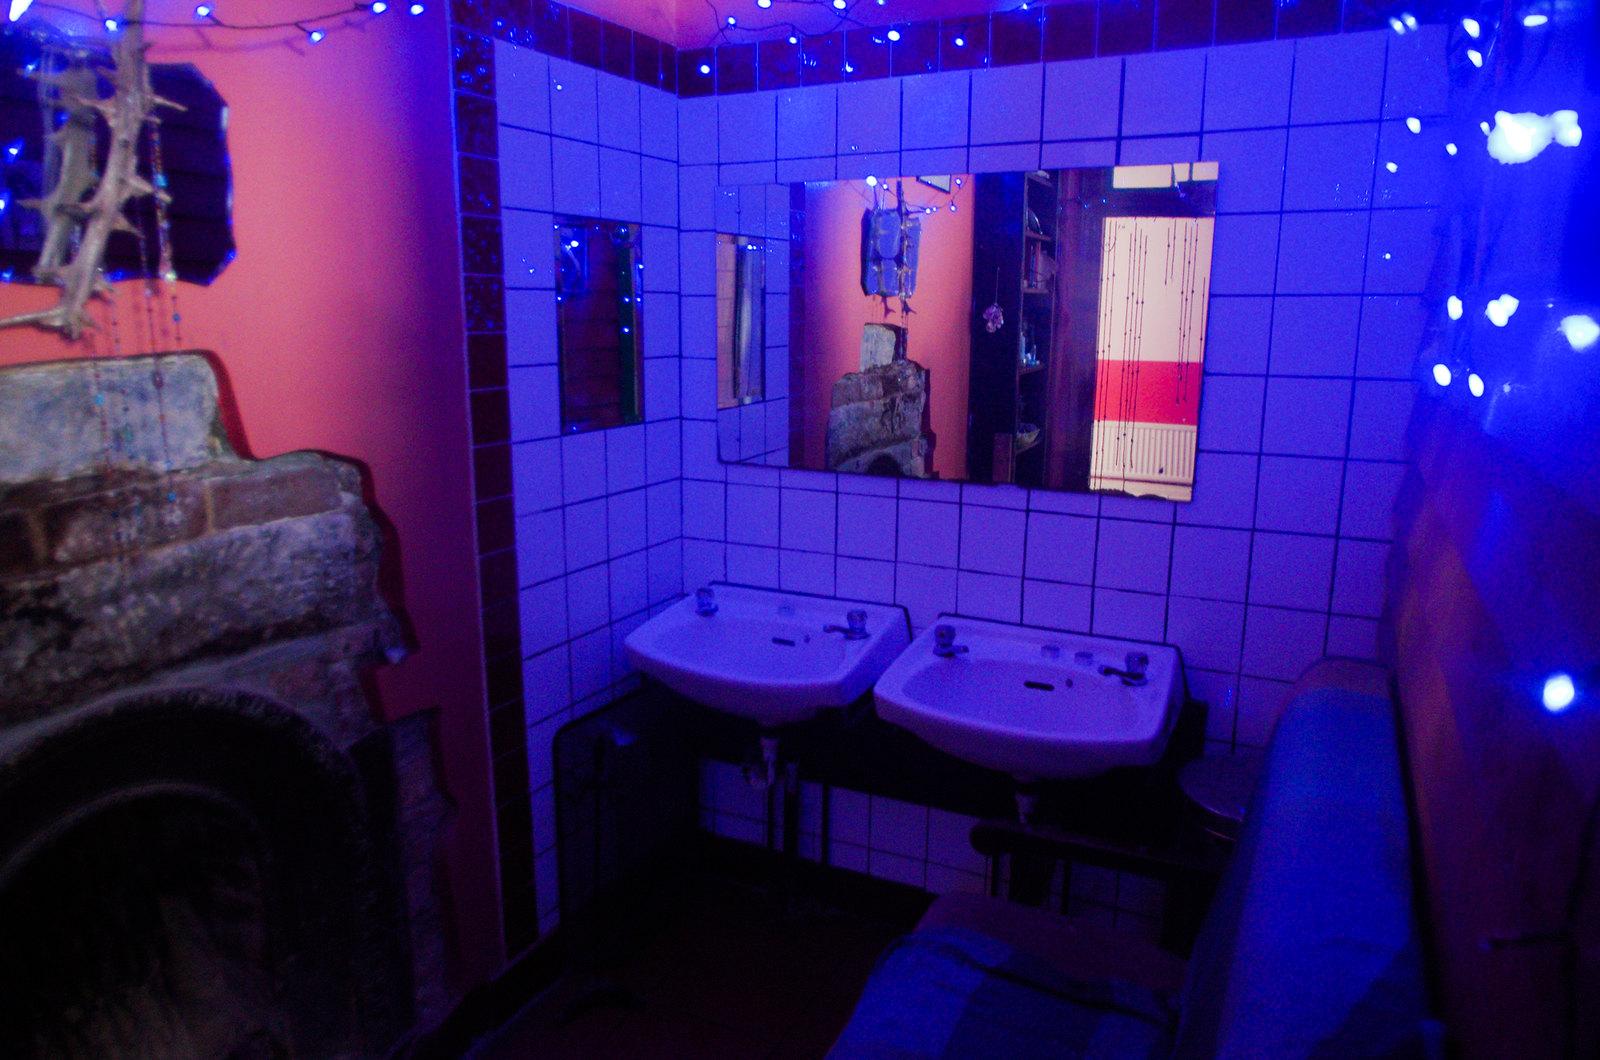 Guirlandes et lavabos